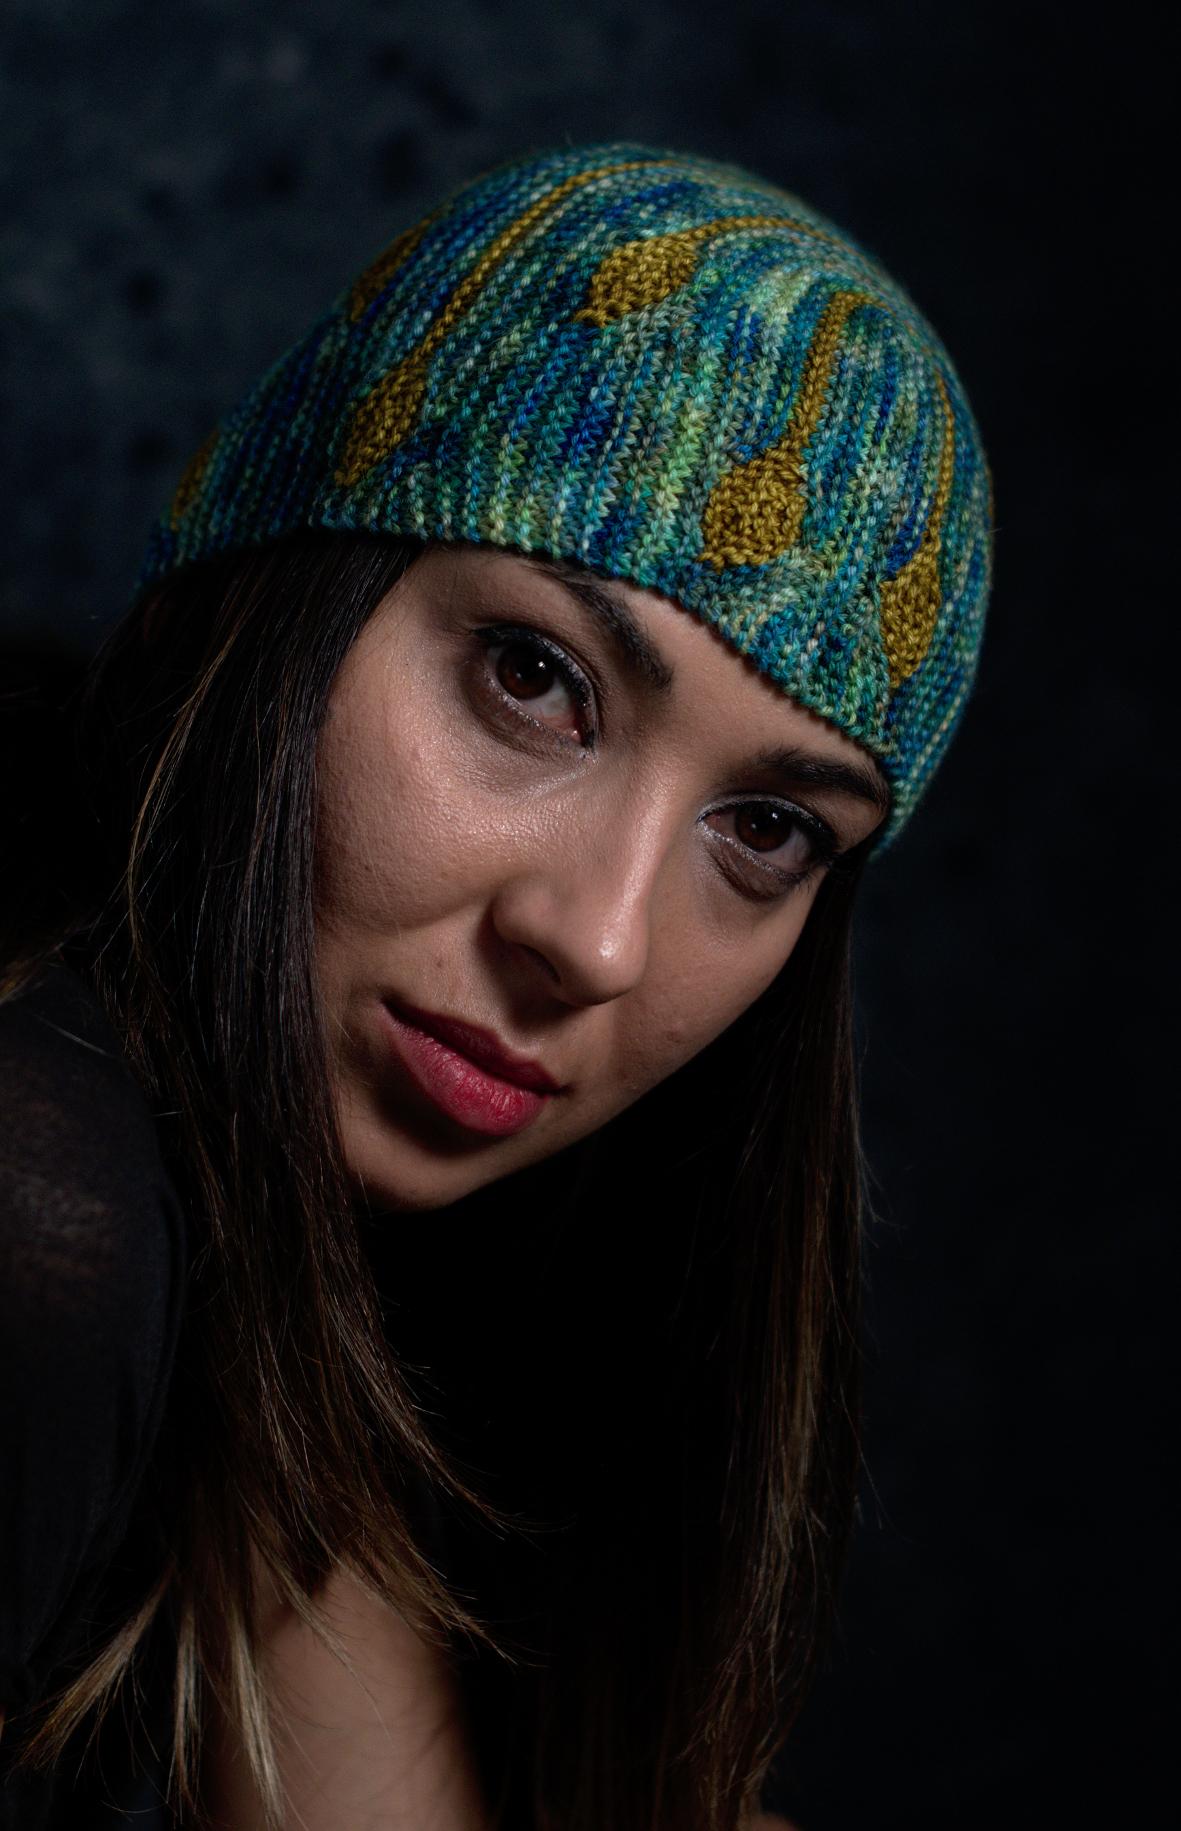 Bilateral sideways knit short row colourwork hat hand knitting pattern